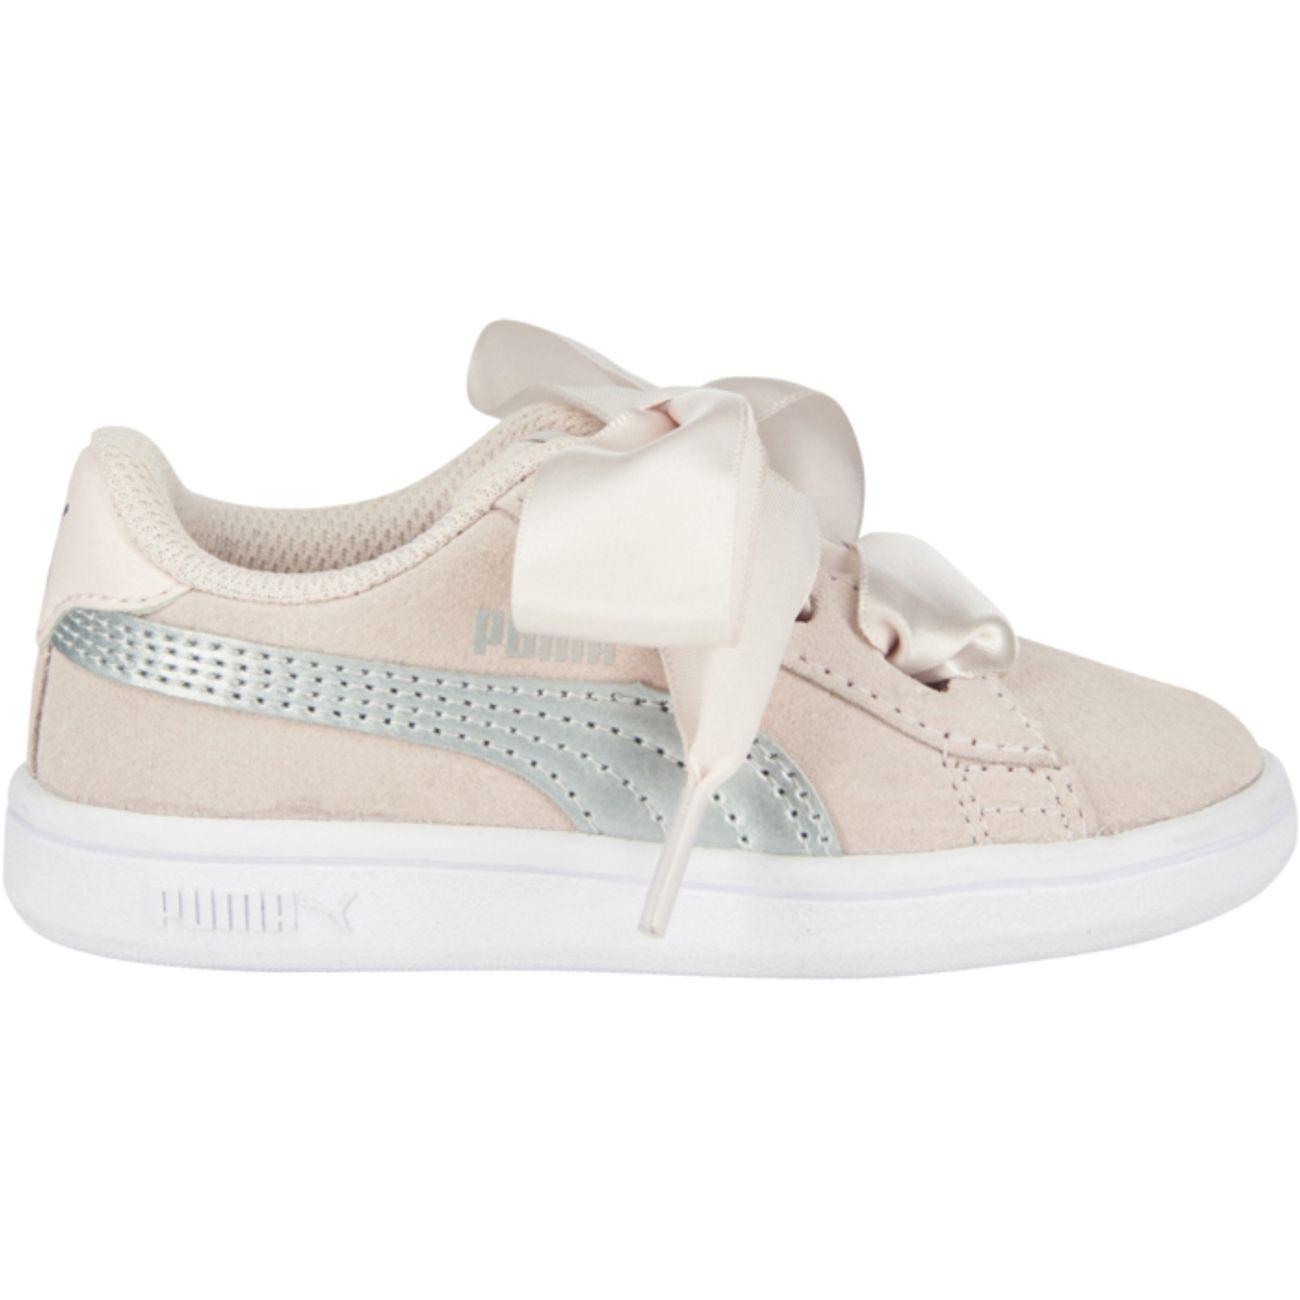 L Smash V2 8ny0x6ai Puma Enfant Regimentationse Chaussures AScjRq35L4